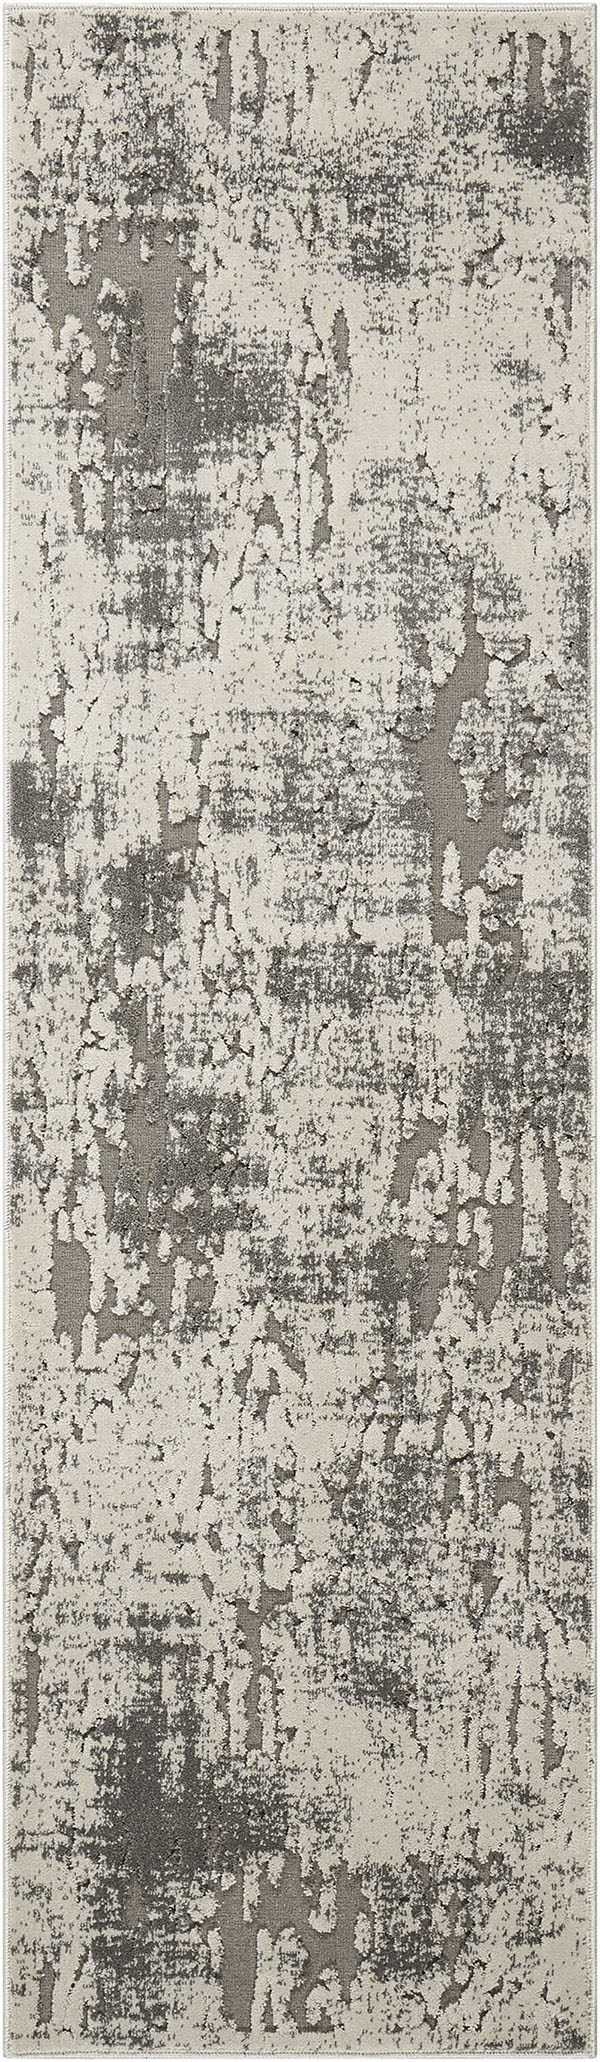 Ivory, Grey Transitional Area Rug